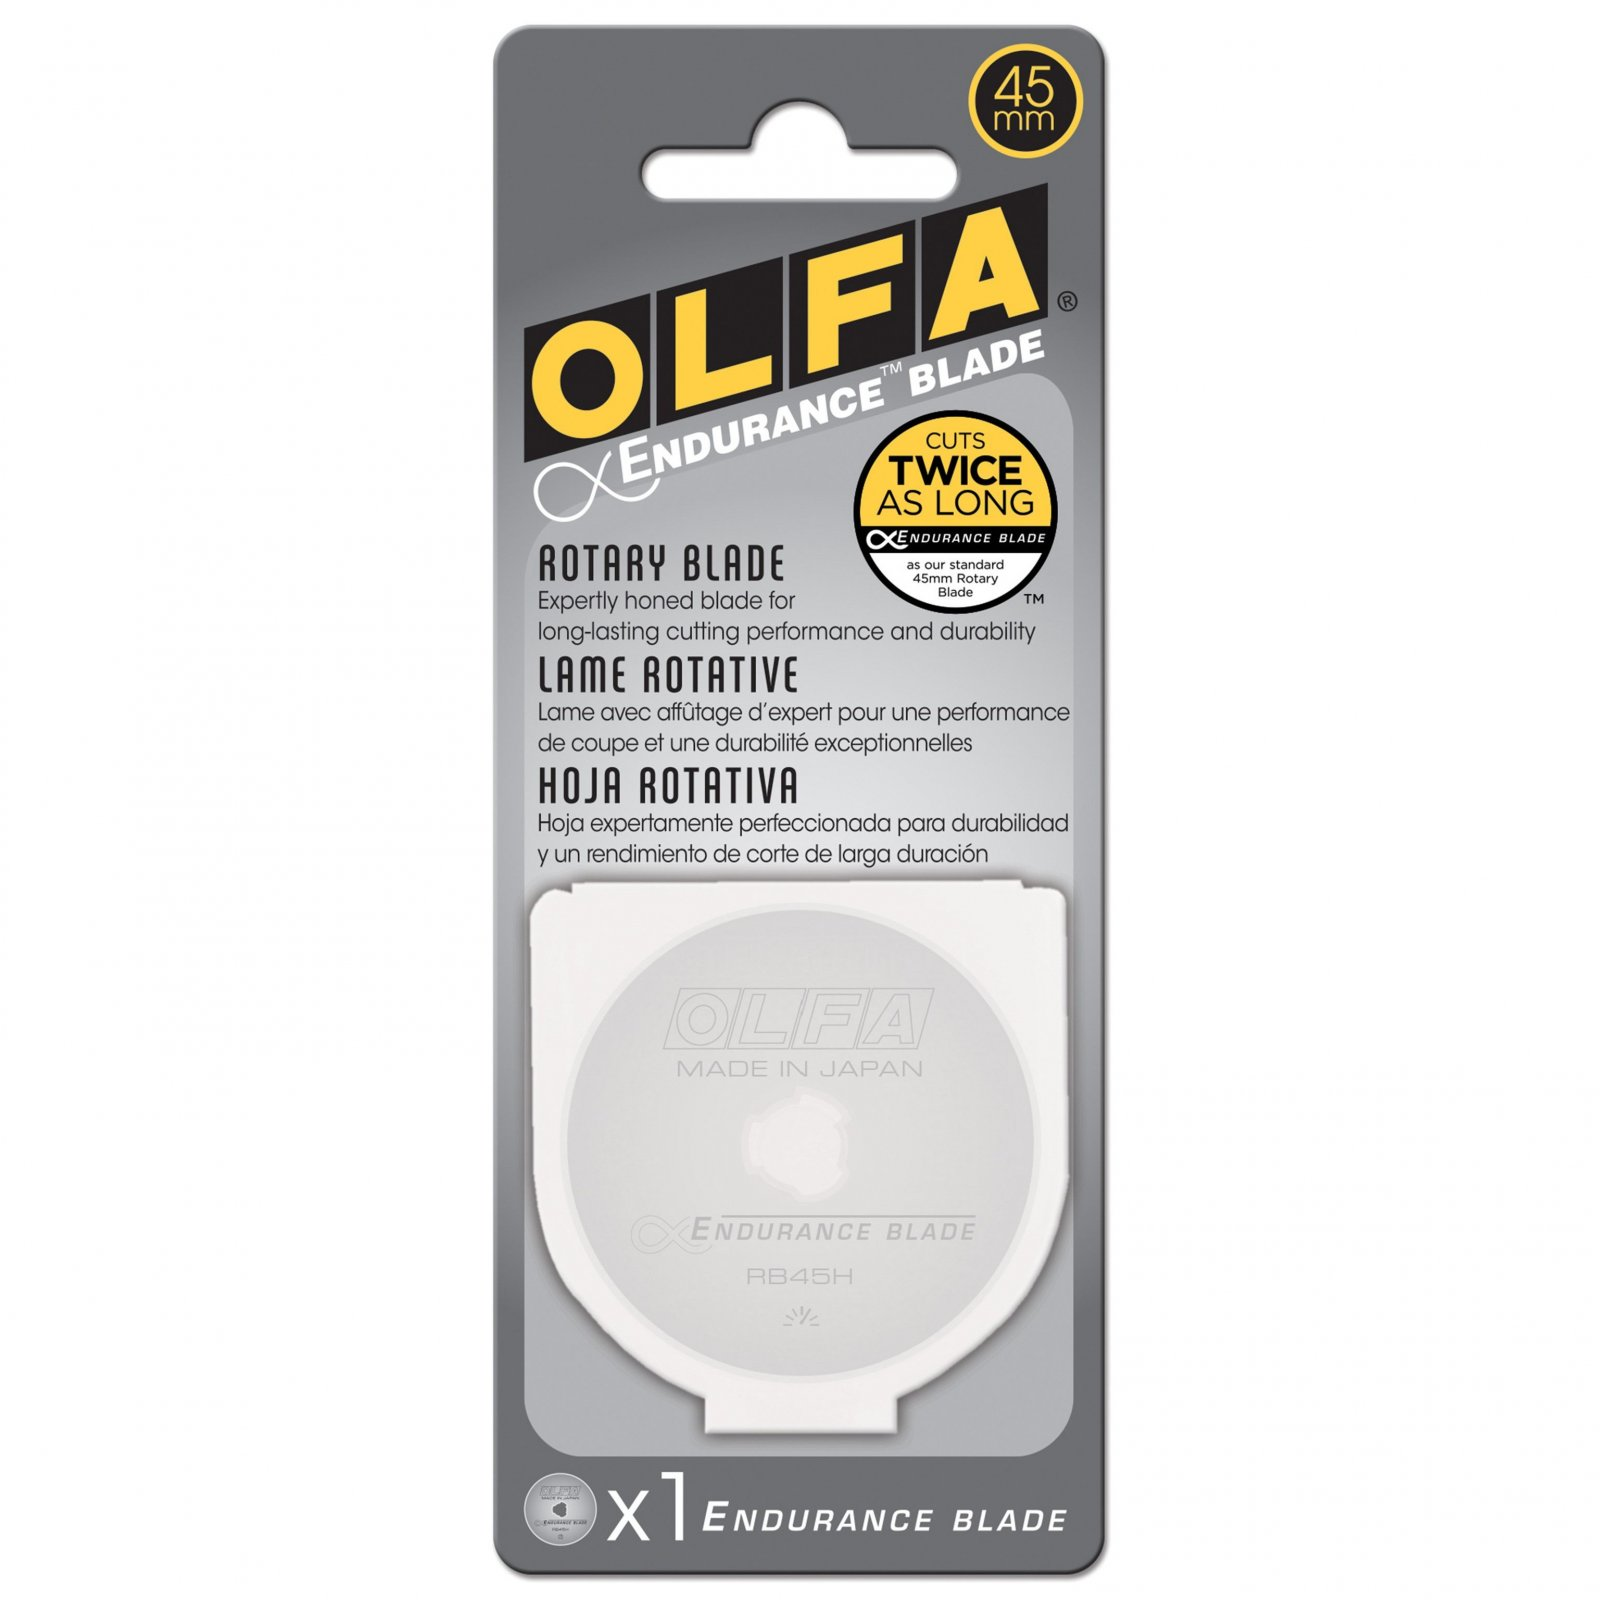 Olfa Endurance Rotary Blades - 1 Pack 45mm